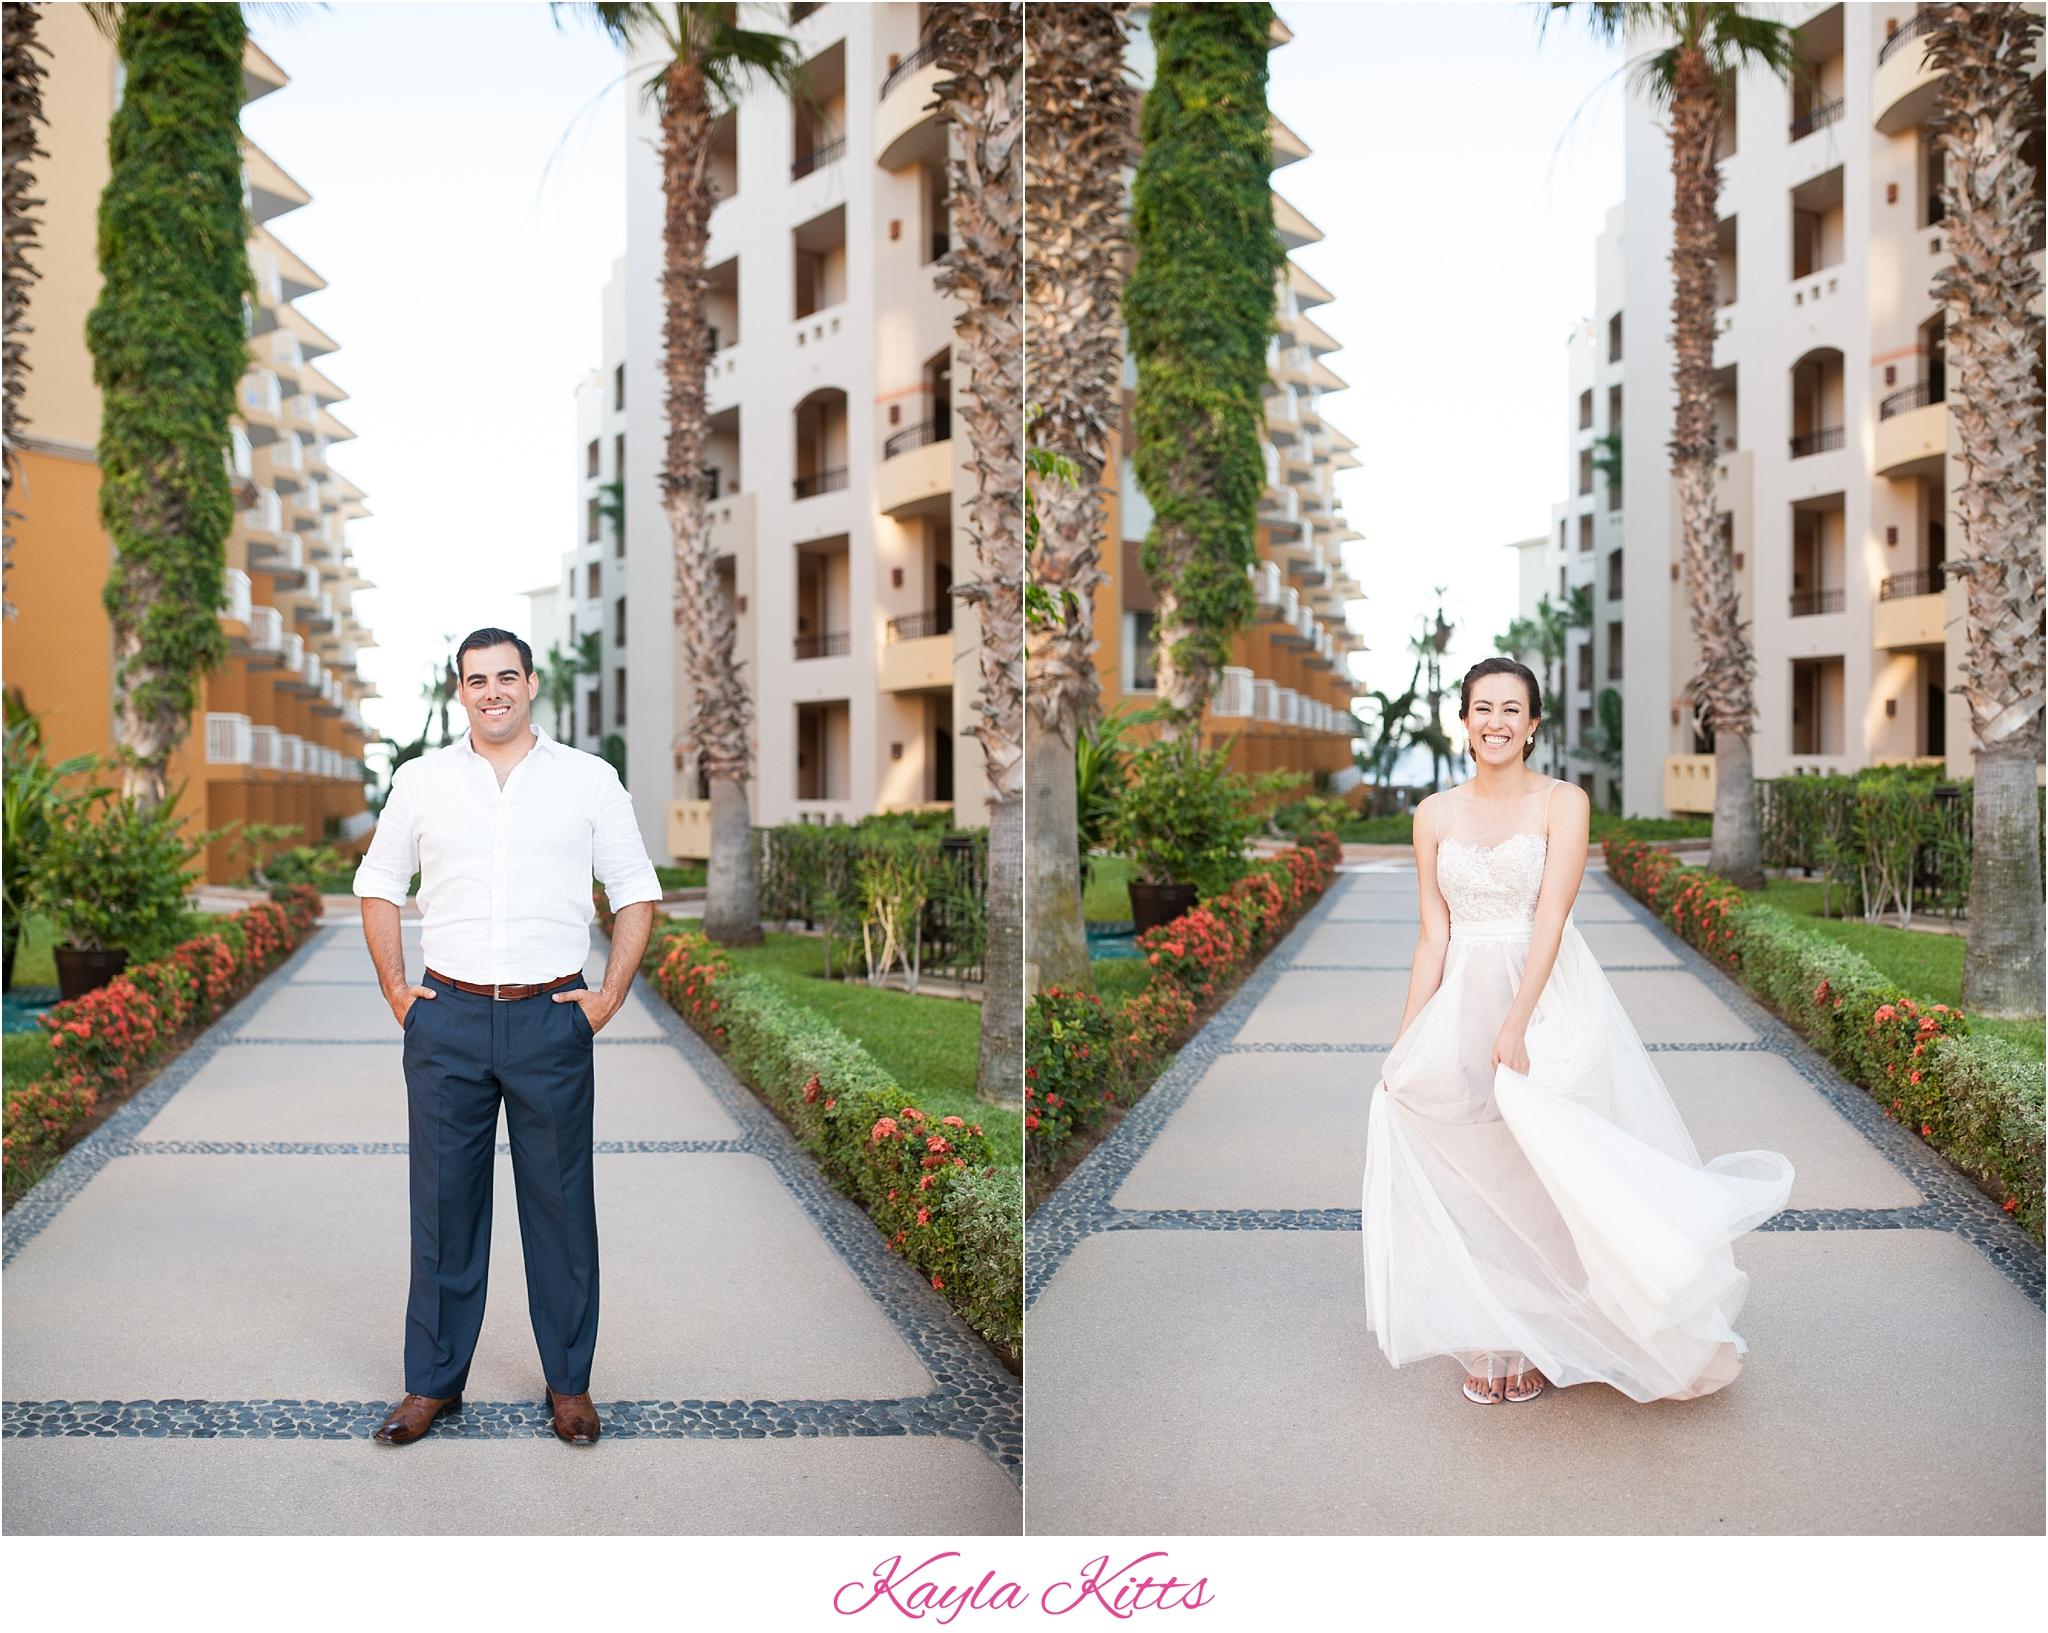 kayla kitts photography-travis and sarah-cabo wedding-cabo wedding photographer-destination wedding photographer-paris wedding photographer-albuquerque wedding-matt jones-albuquerque wedding vendor-intimate wedding_0027.jpg